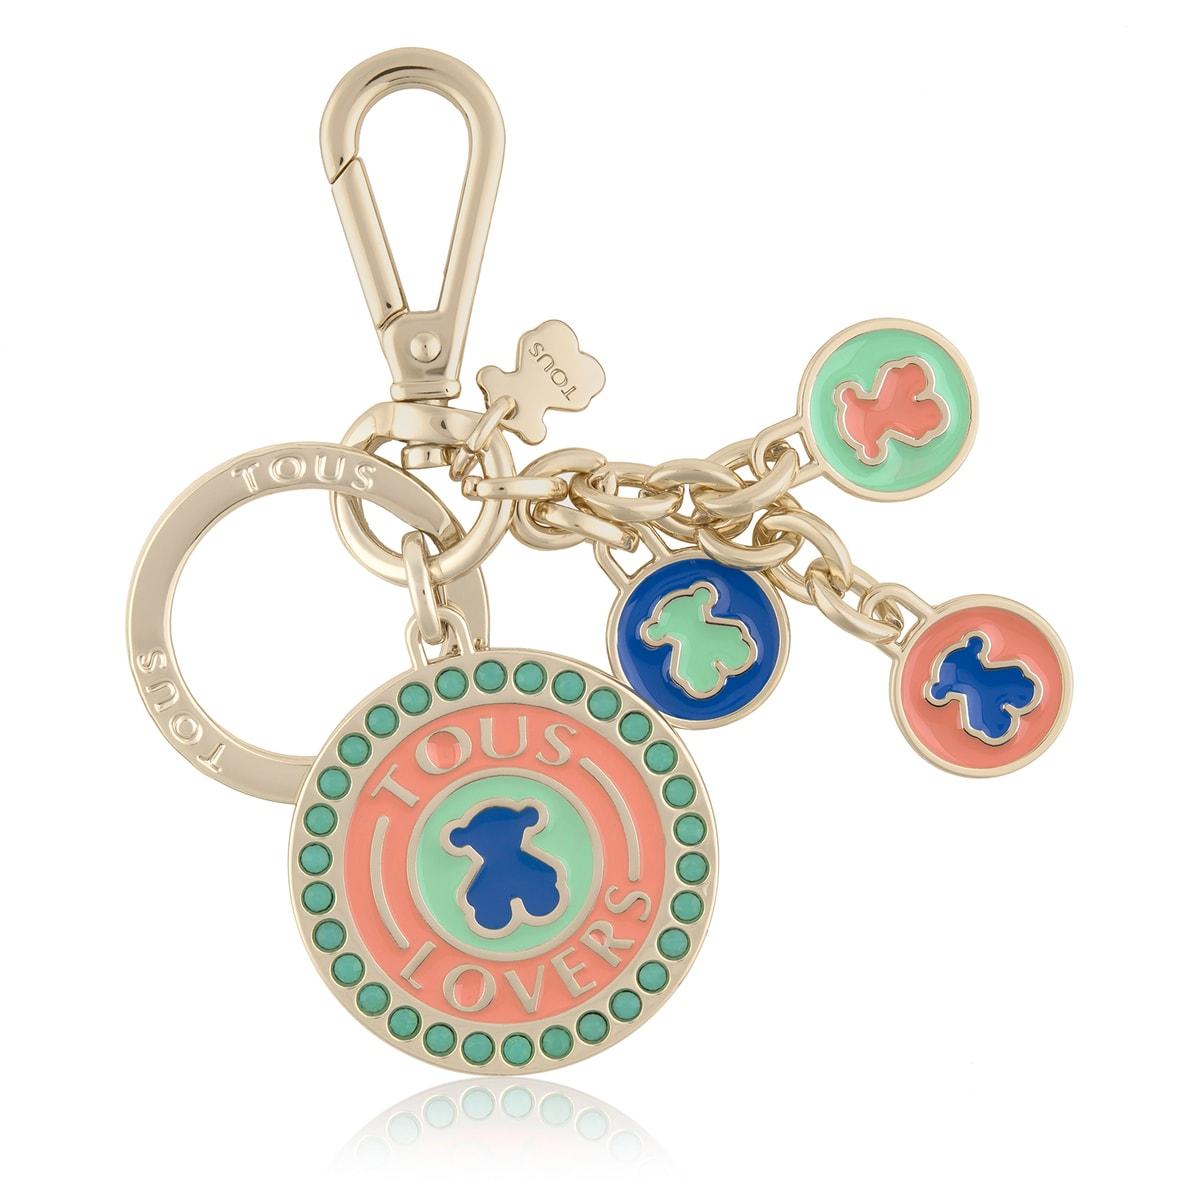 Porta-chaves TOUS Lovers Medals Azul - Laranja